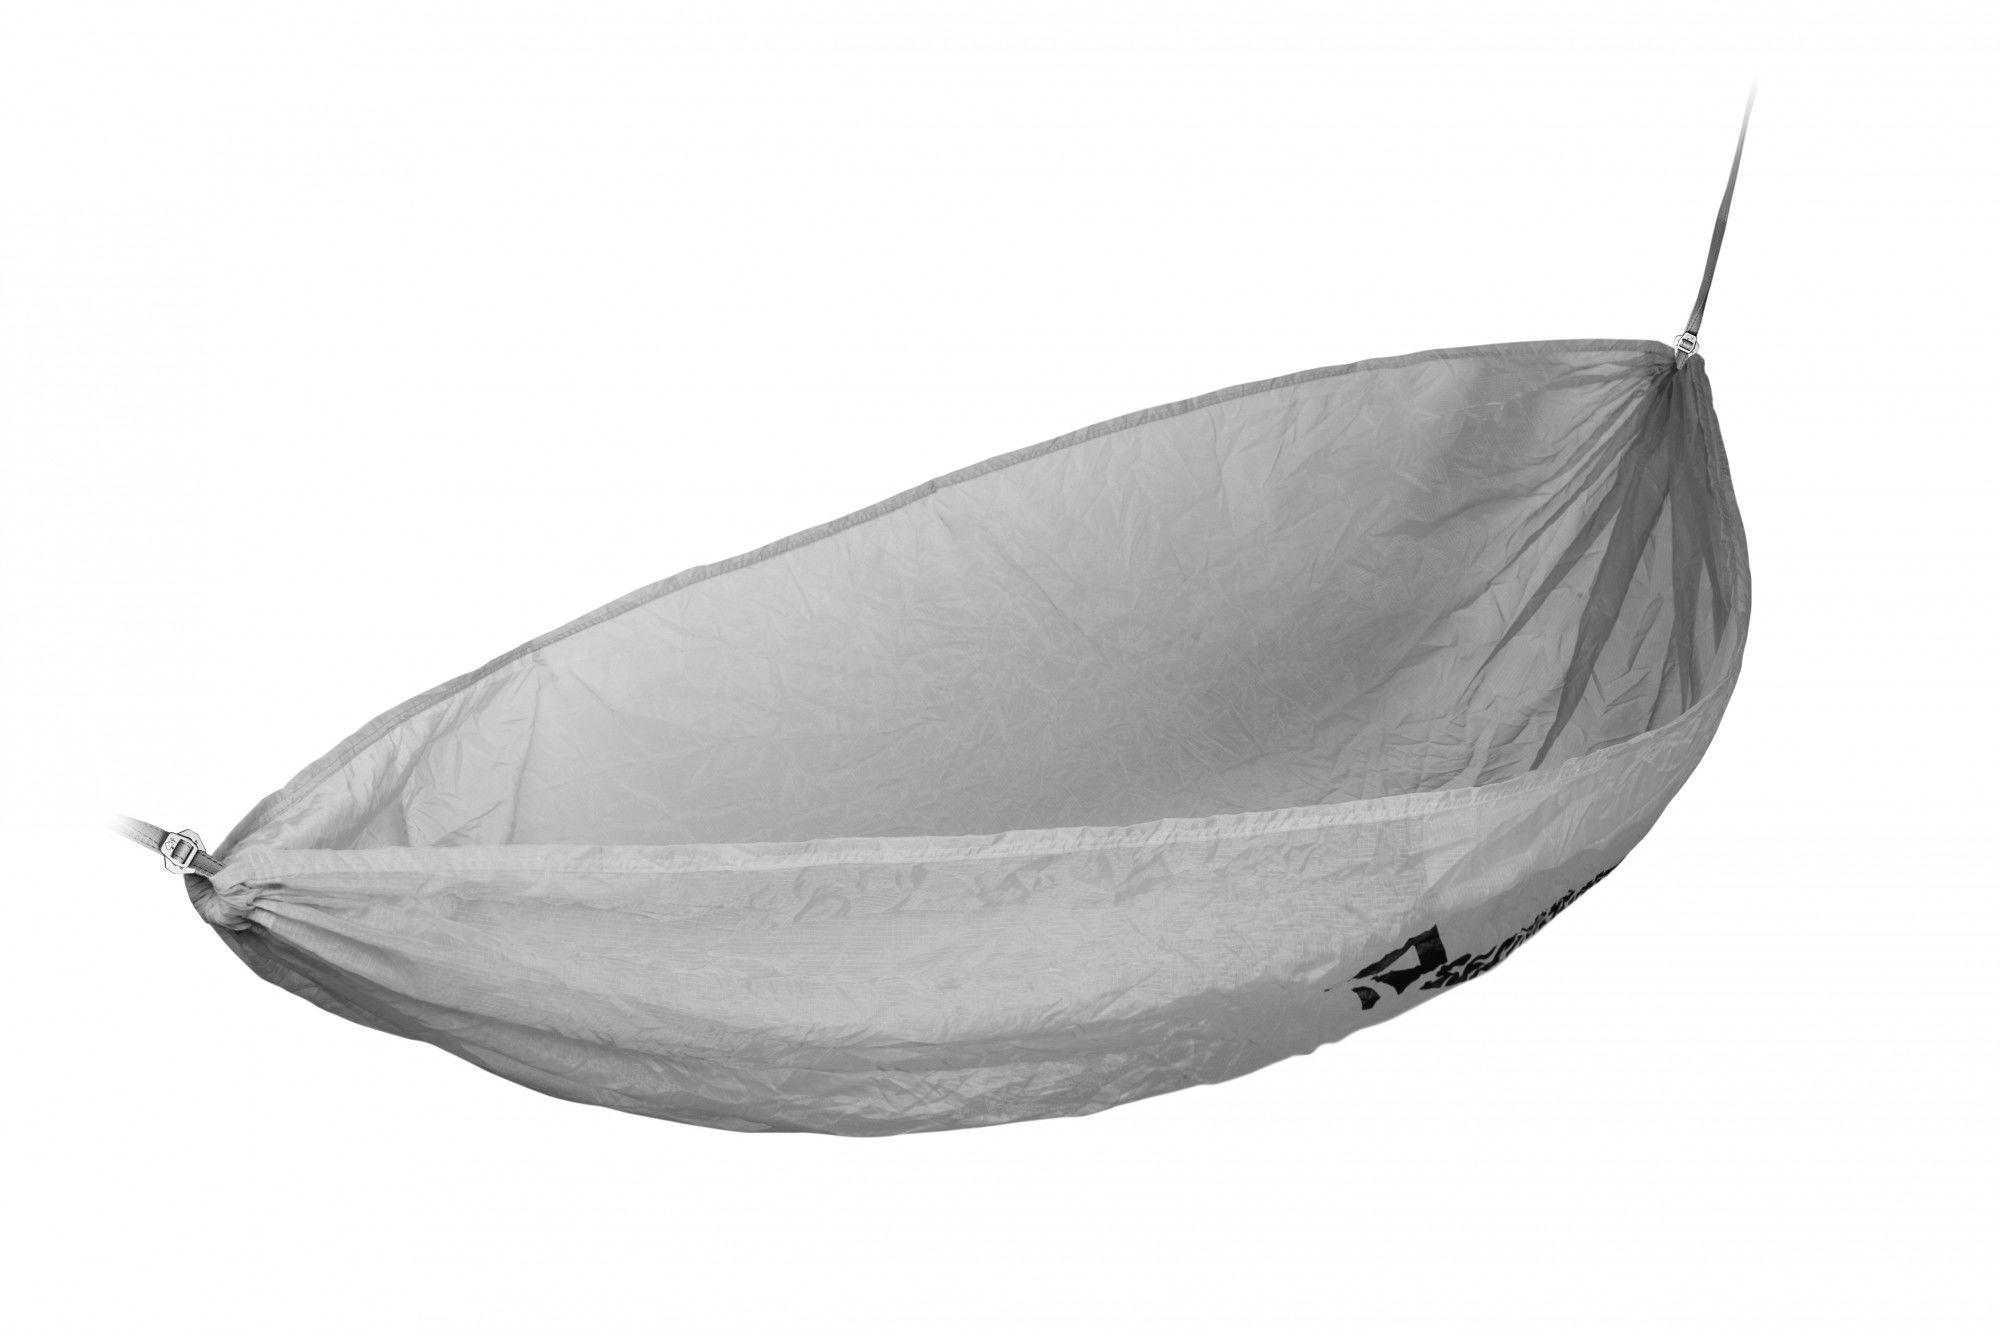 Sea to Summit Hammock Ultralight Single | Größe One Size |  Hängematte